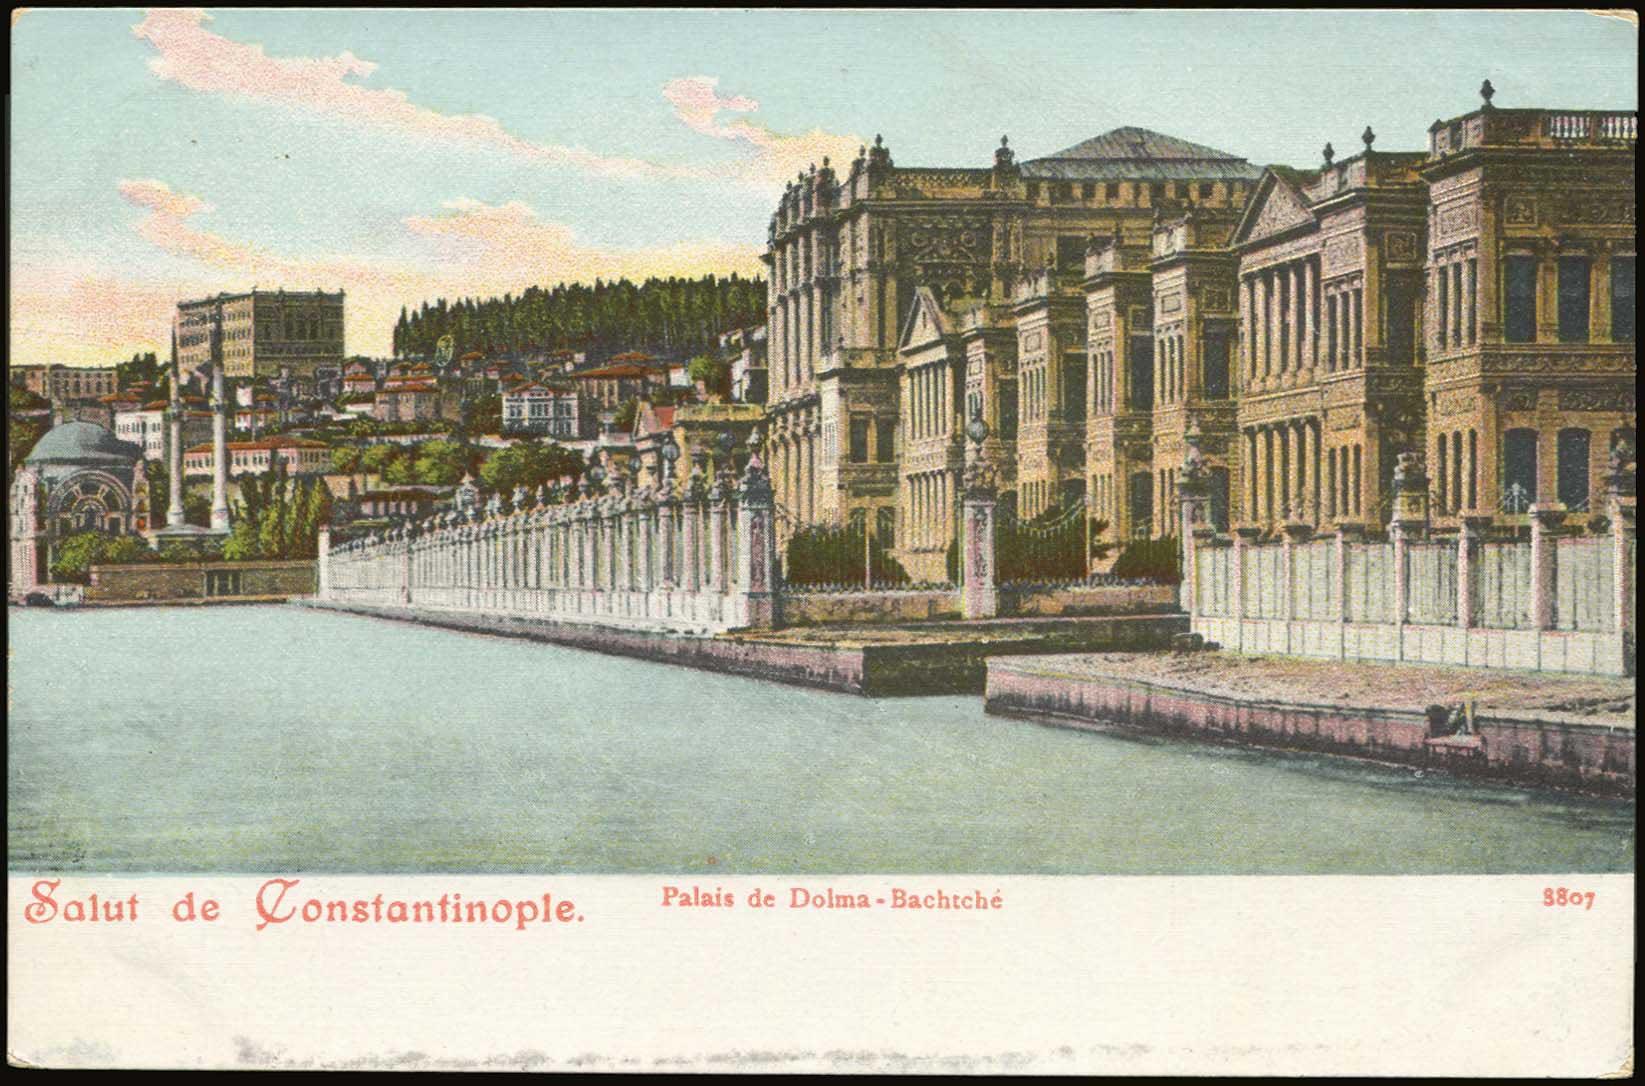 Lot 1560 - picture postcards SMYRNE, CONSTANTINOPLE, ASIA MINOR -  A. Karamitsos Postal & Live Internet Auction 680 General Philatelic Auction